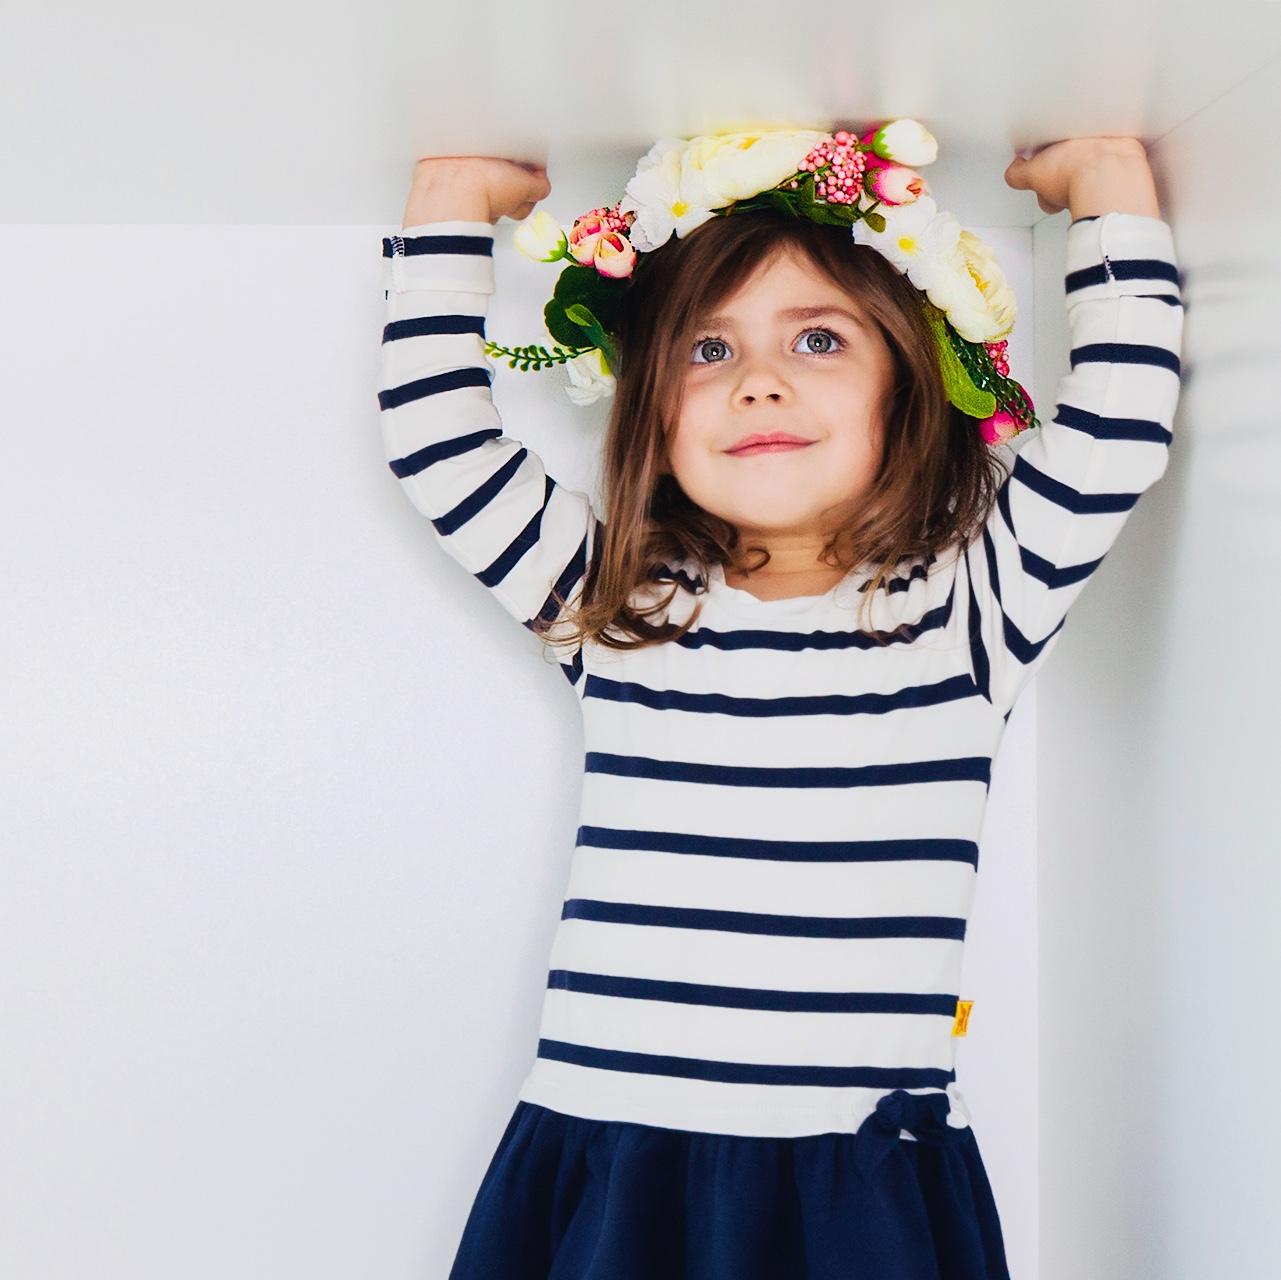 galerie-littleboxes-08-kindergartenfotografie